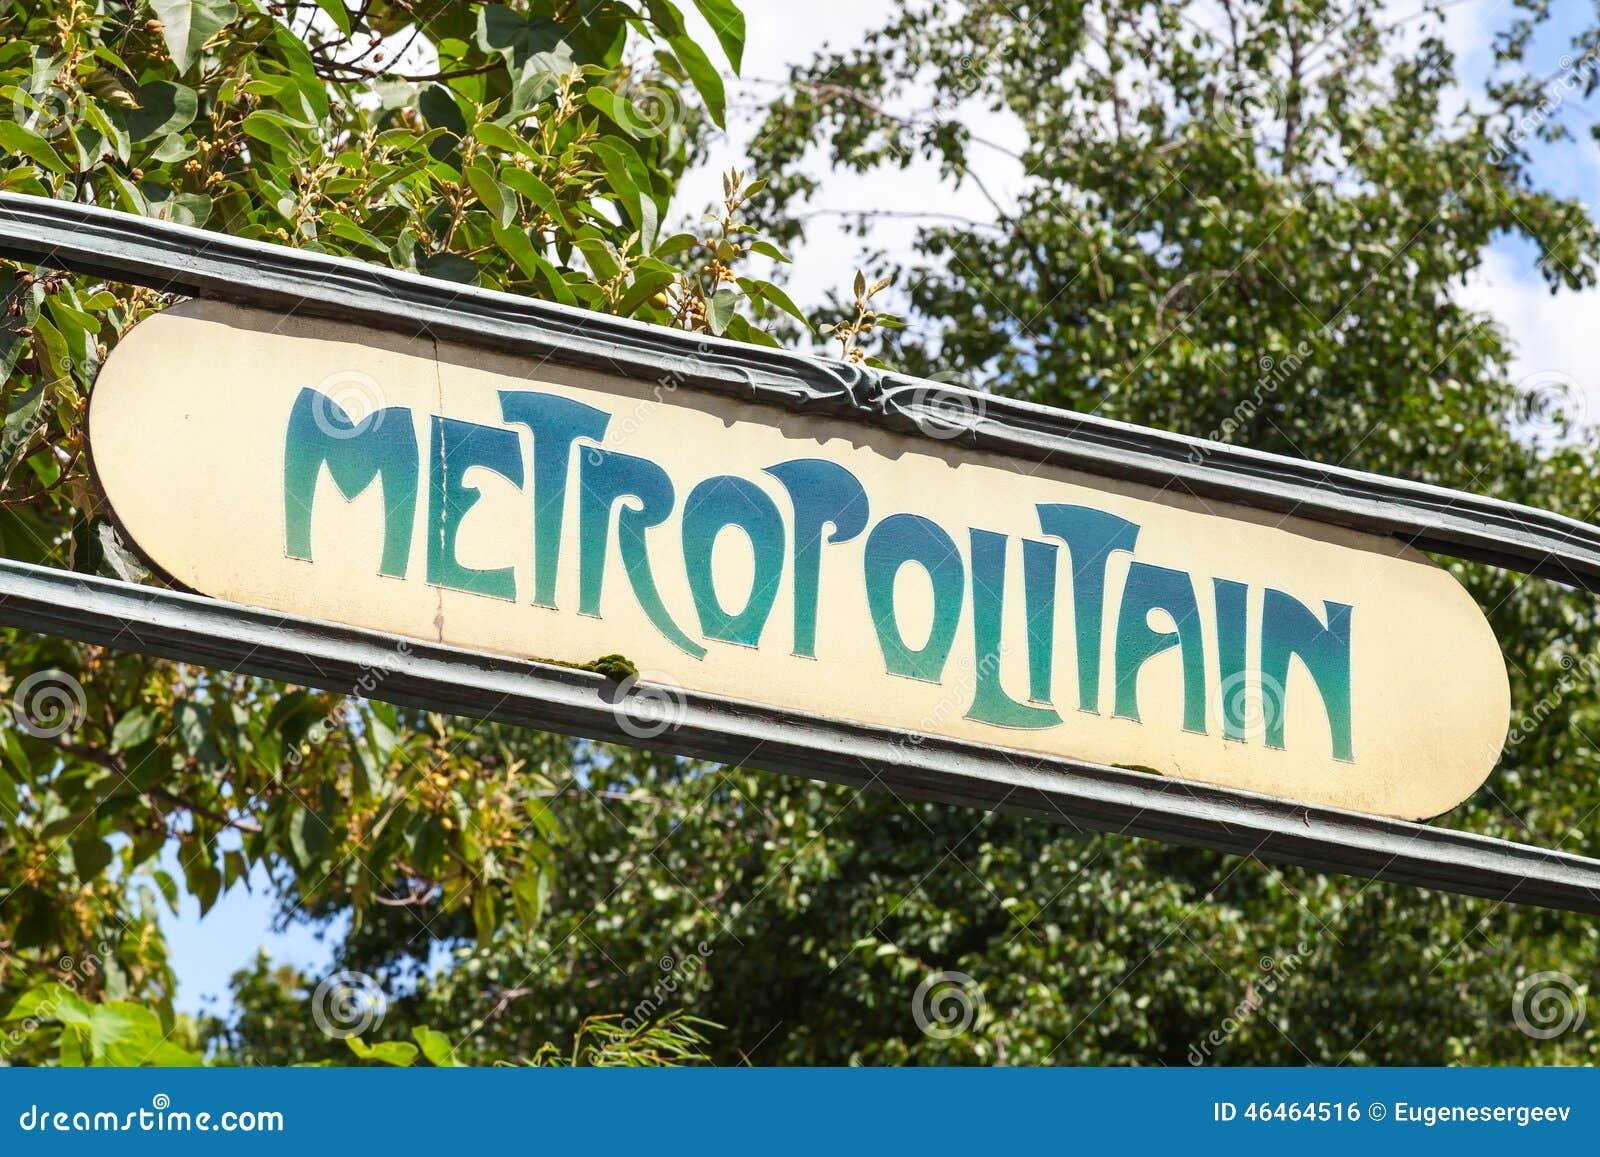 Plaque Metro Parisien Deco art-deco street sign at the entrance to the paris metro